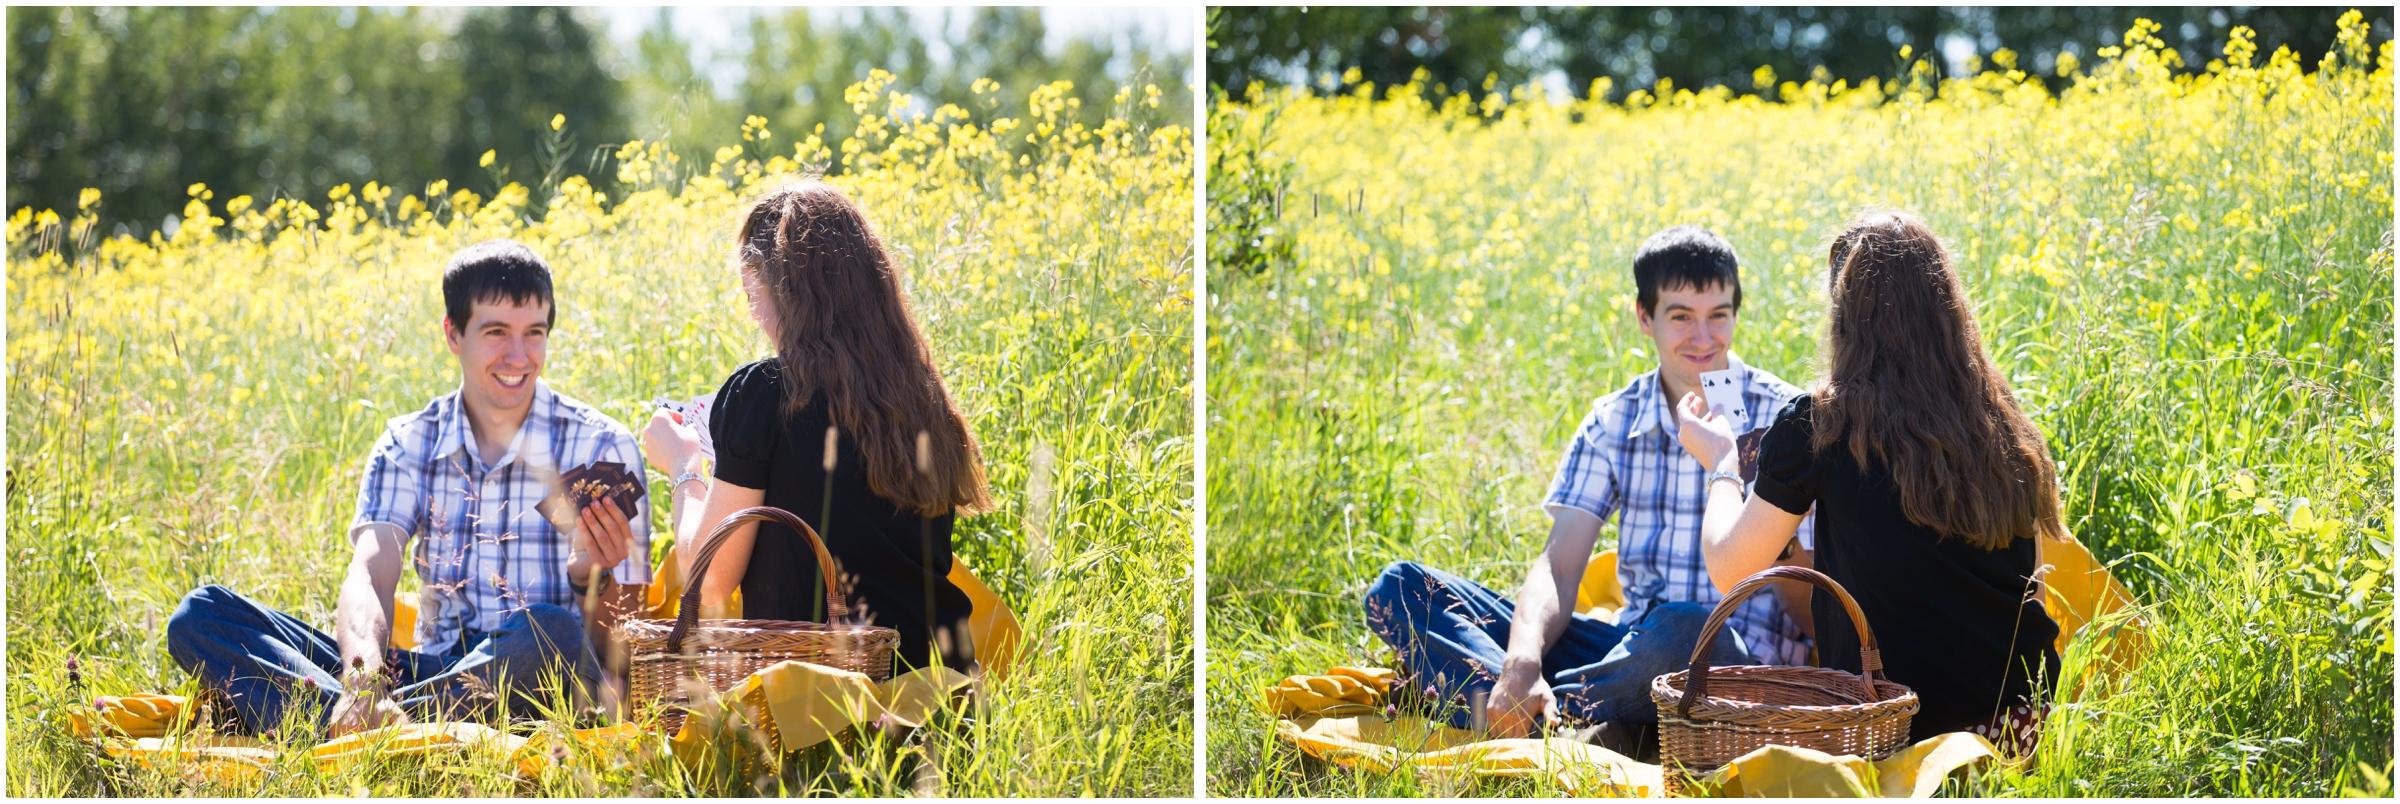 Hannah and Jarrett Selena Phillips-Boyle_0008.jpg